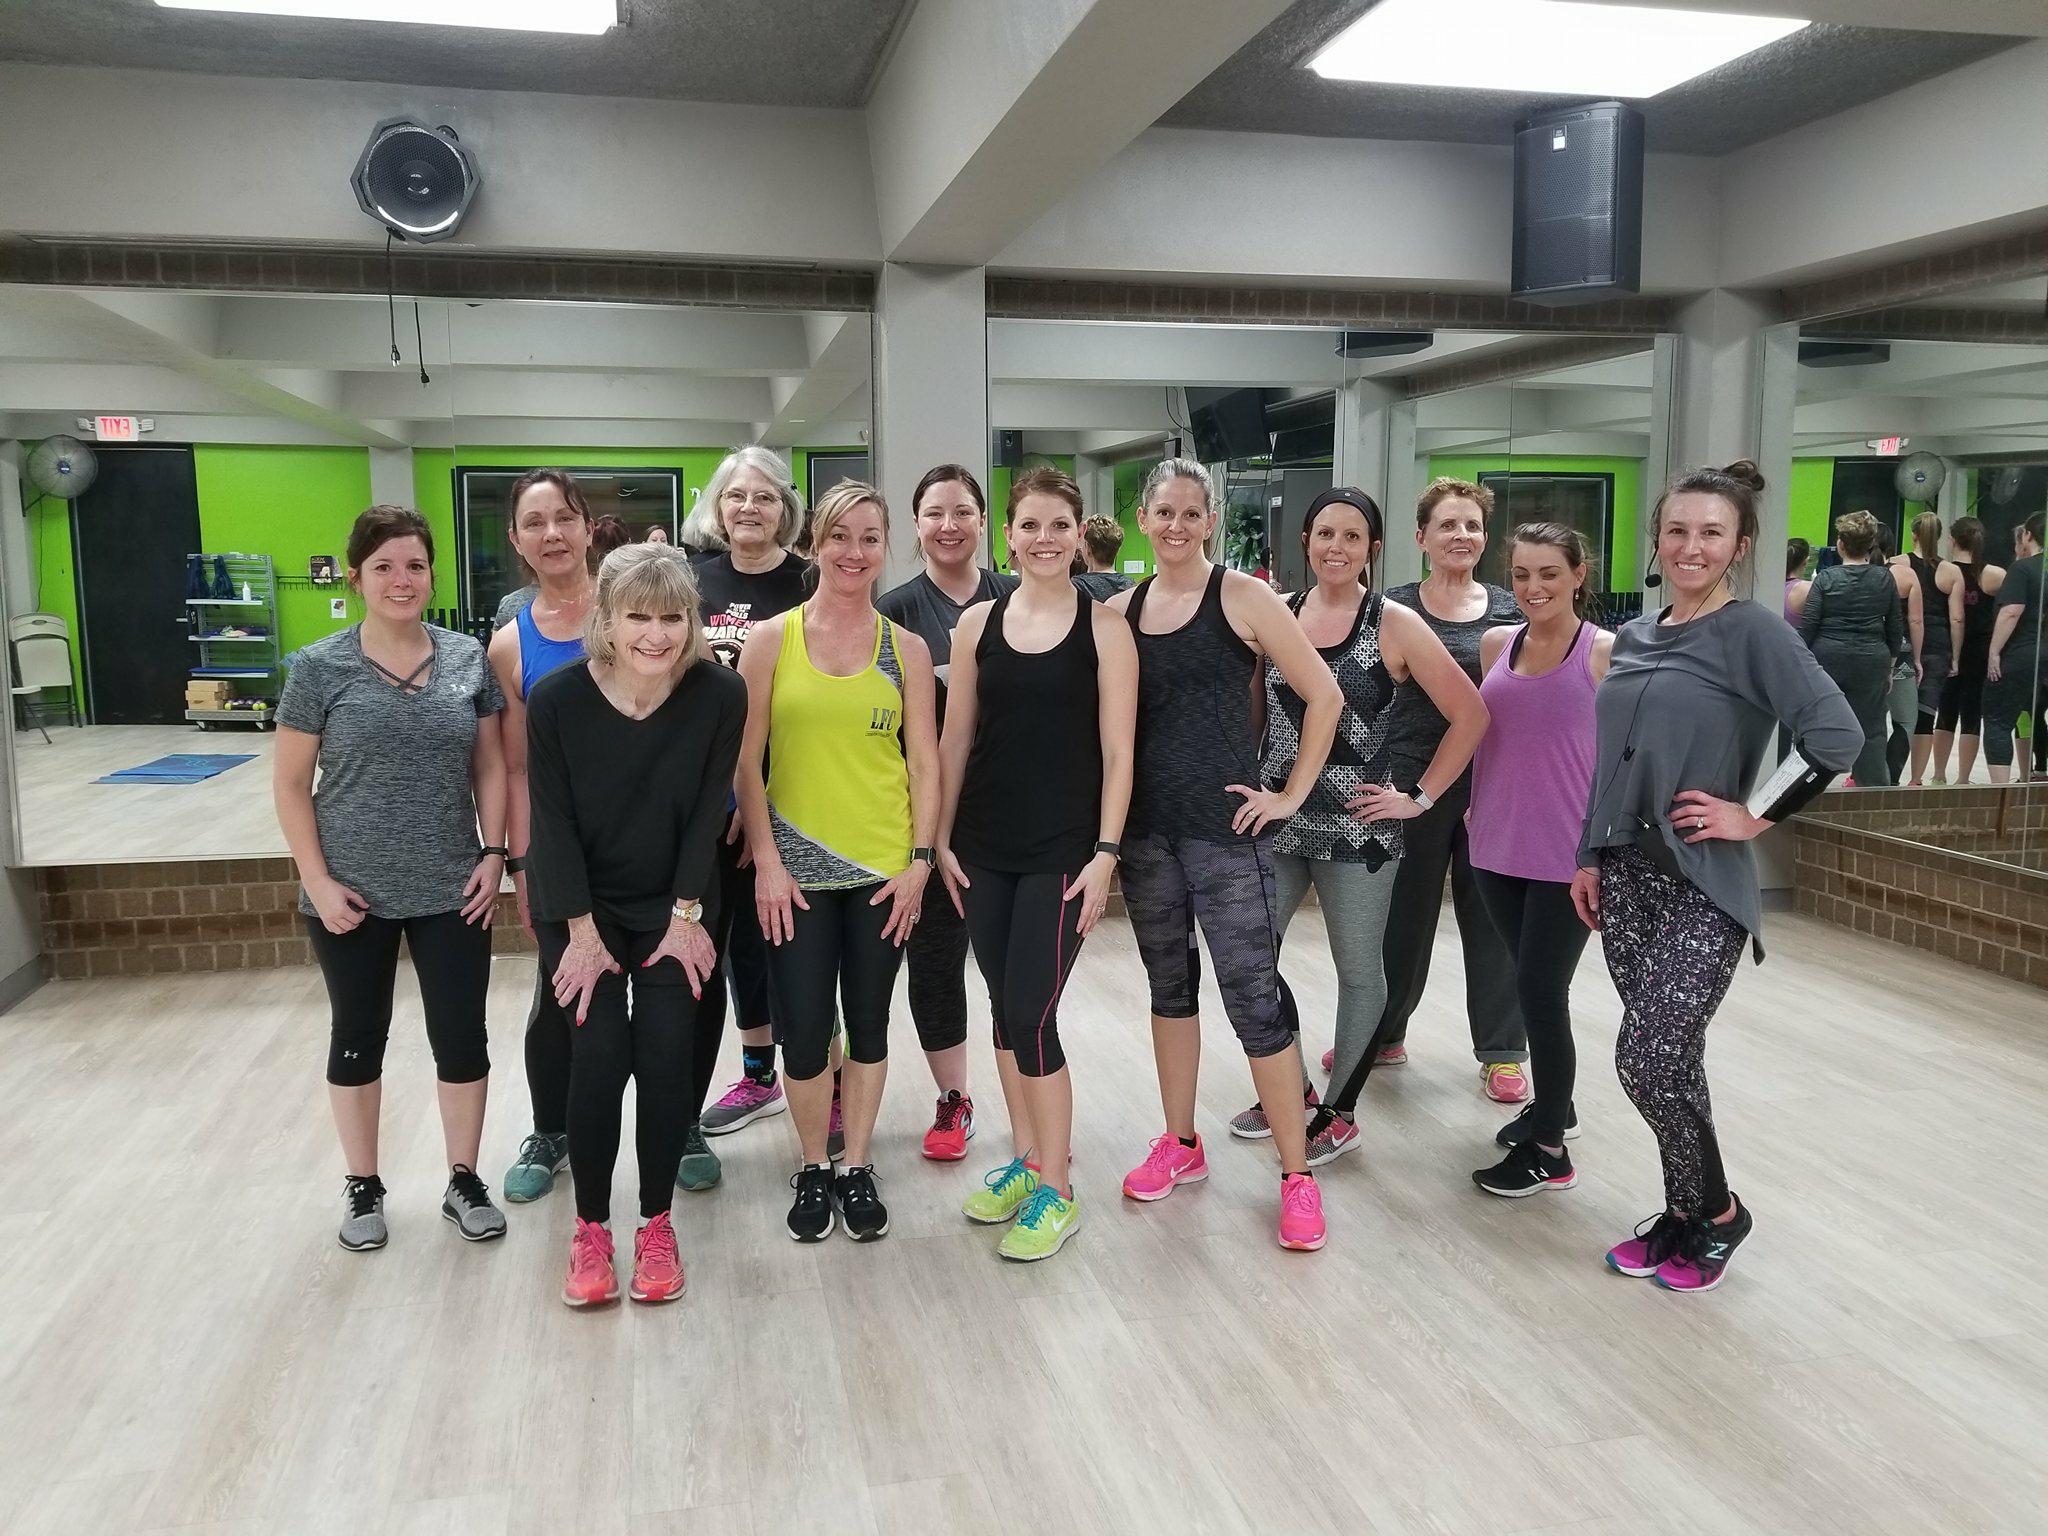 Total Body Strength - February 2018